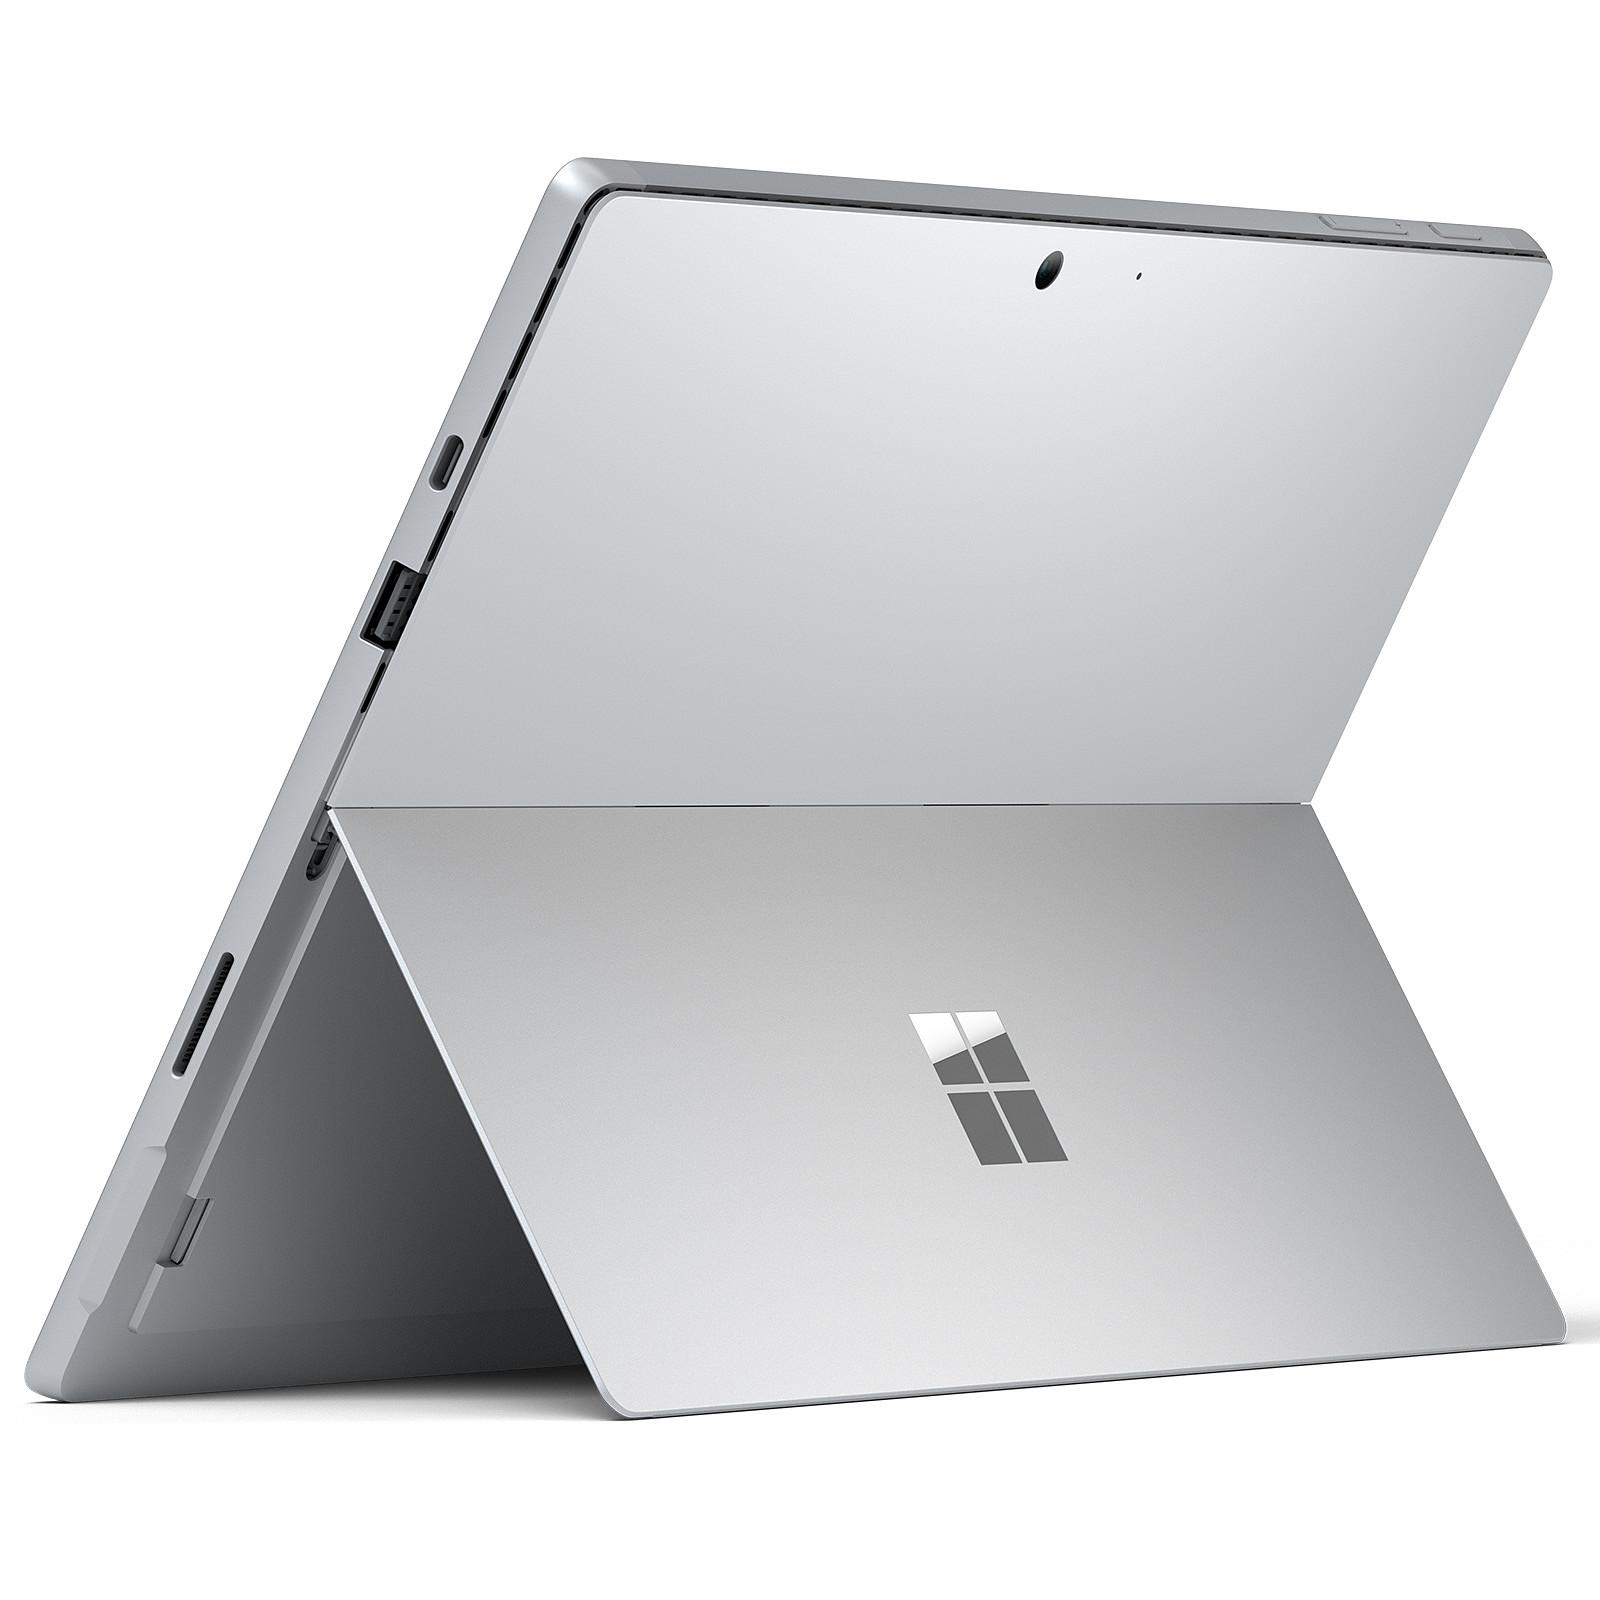 Microsoft Surface Pro 7 for Business - Platine (PVR-00003) - PC portable Microsoft sur LDLC